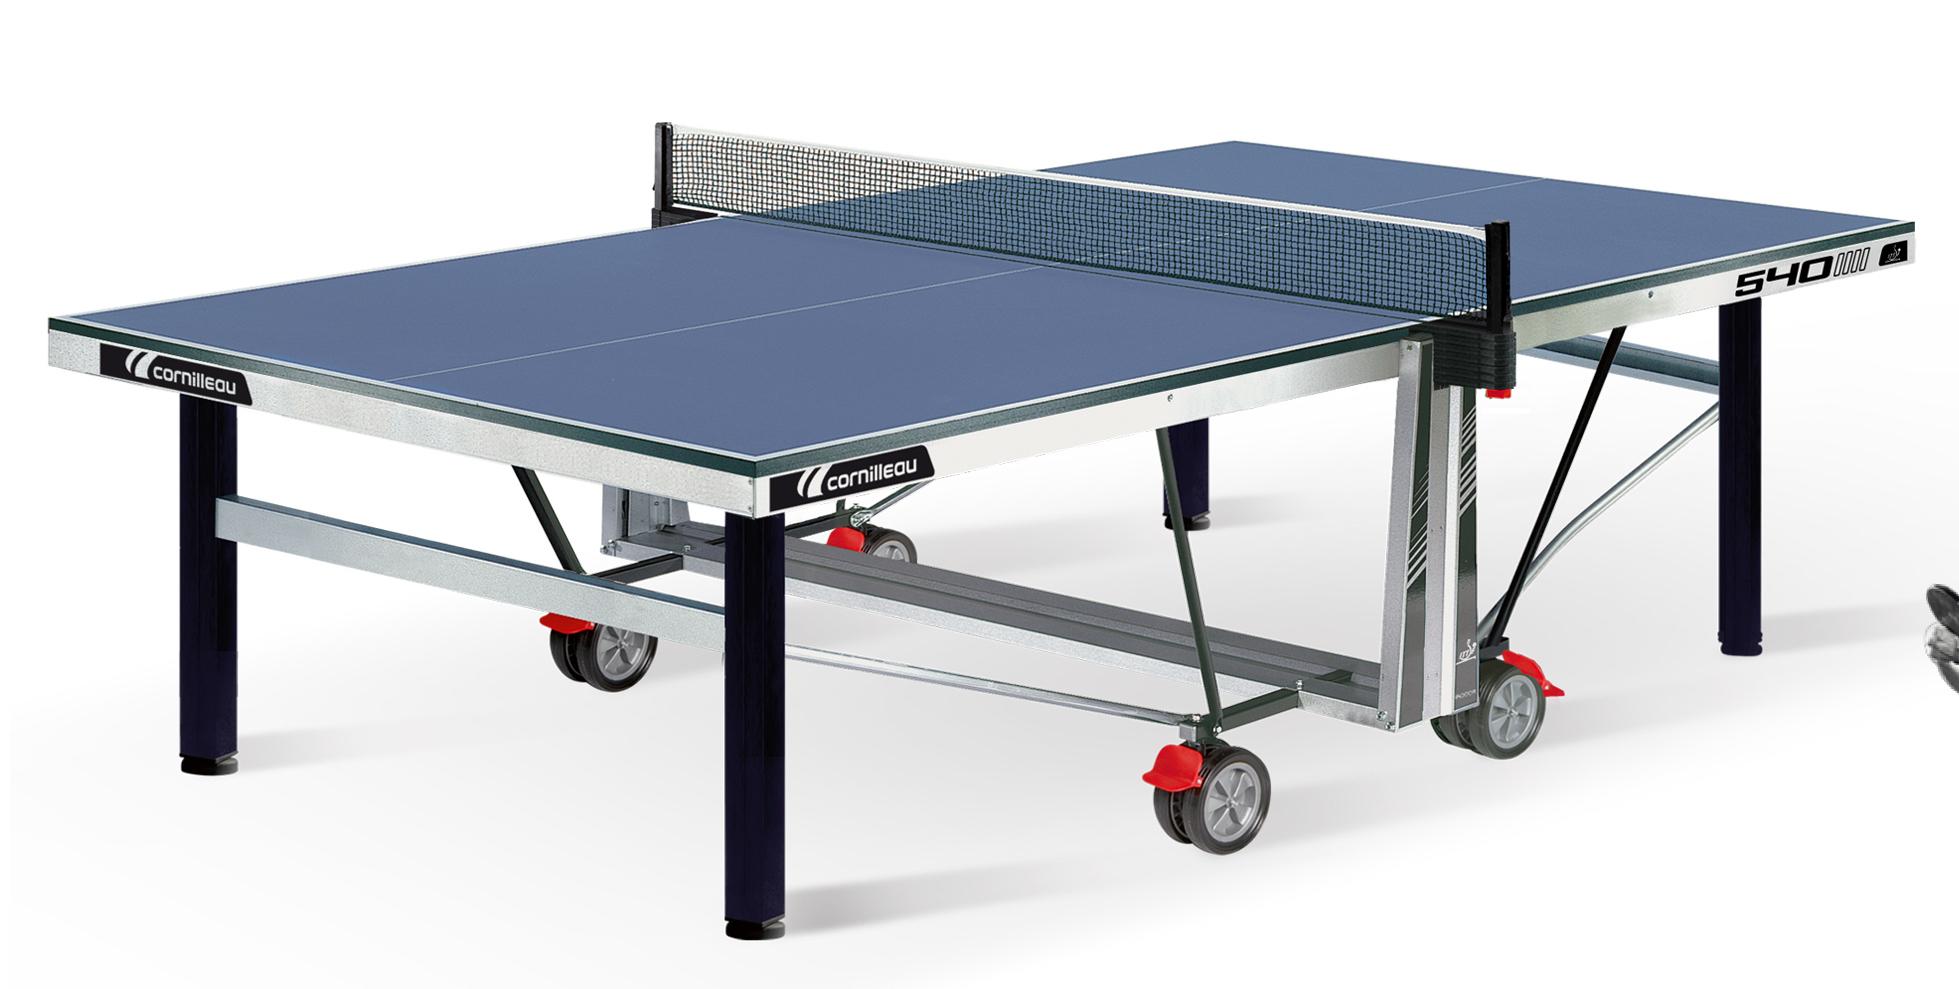 Cornilleau 540 Indoor Table Tennis Table: